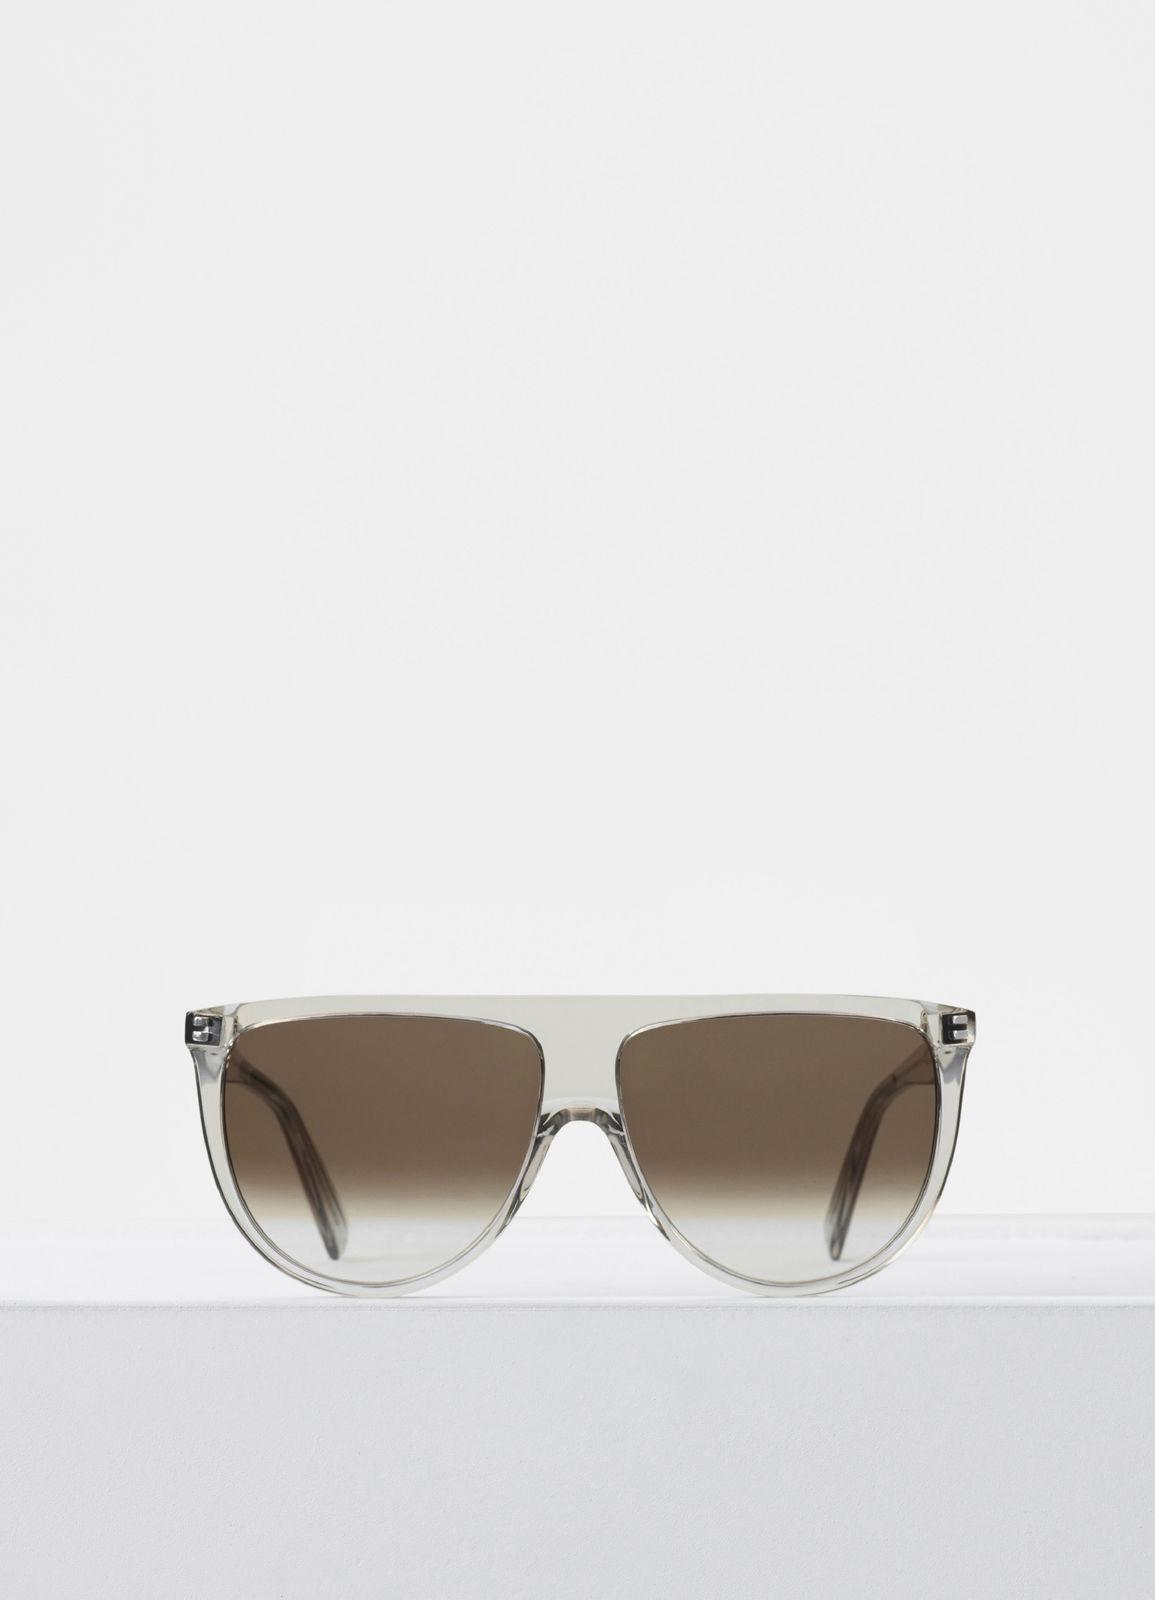 CELINE- CL40006I Sunglasses  £270  COLOUR: Transparent  CATEGORY SUN  MATERIAL Acetate  SHAPE Square